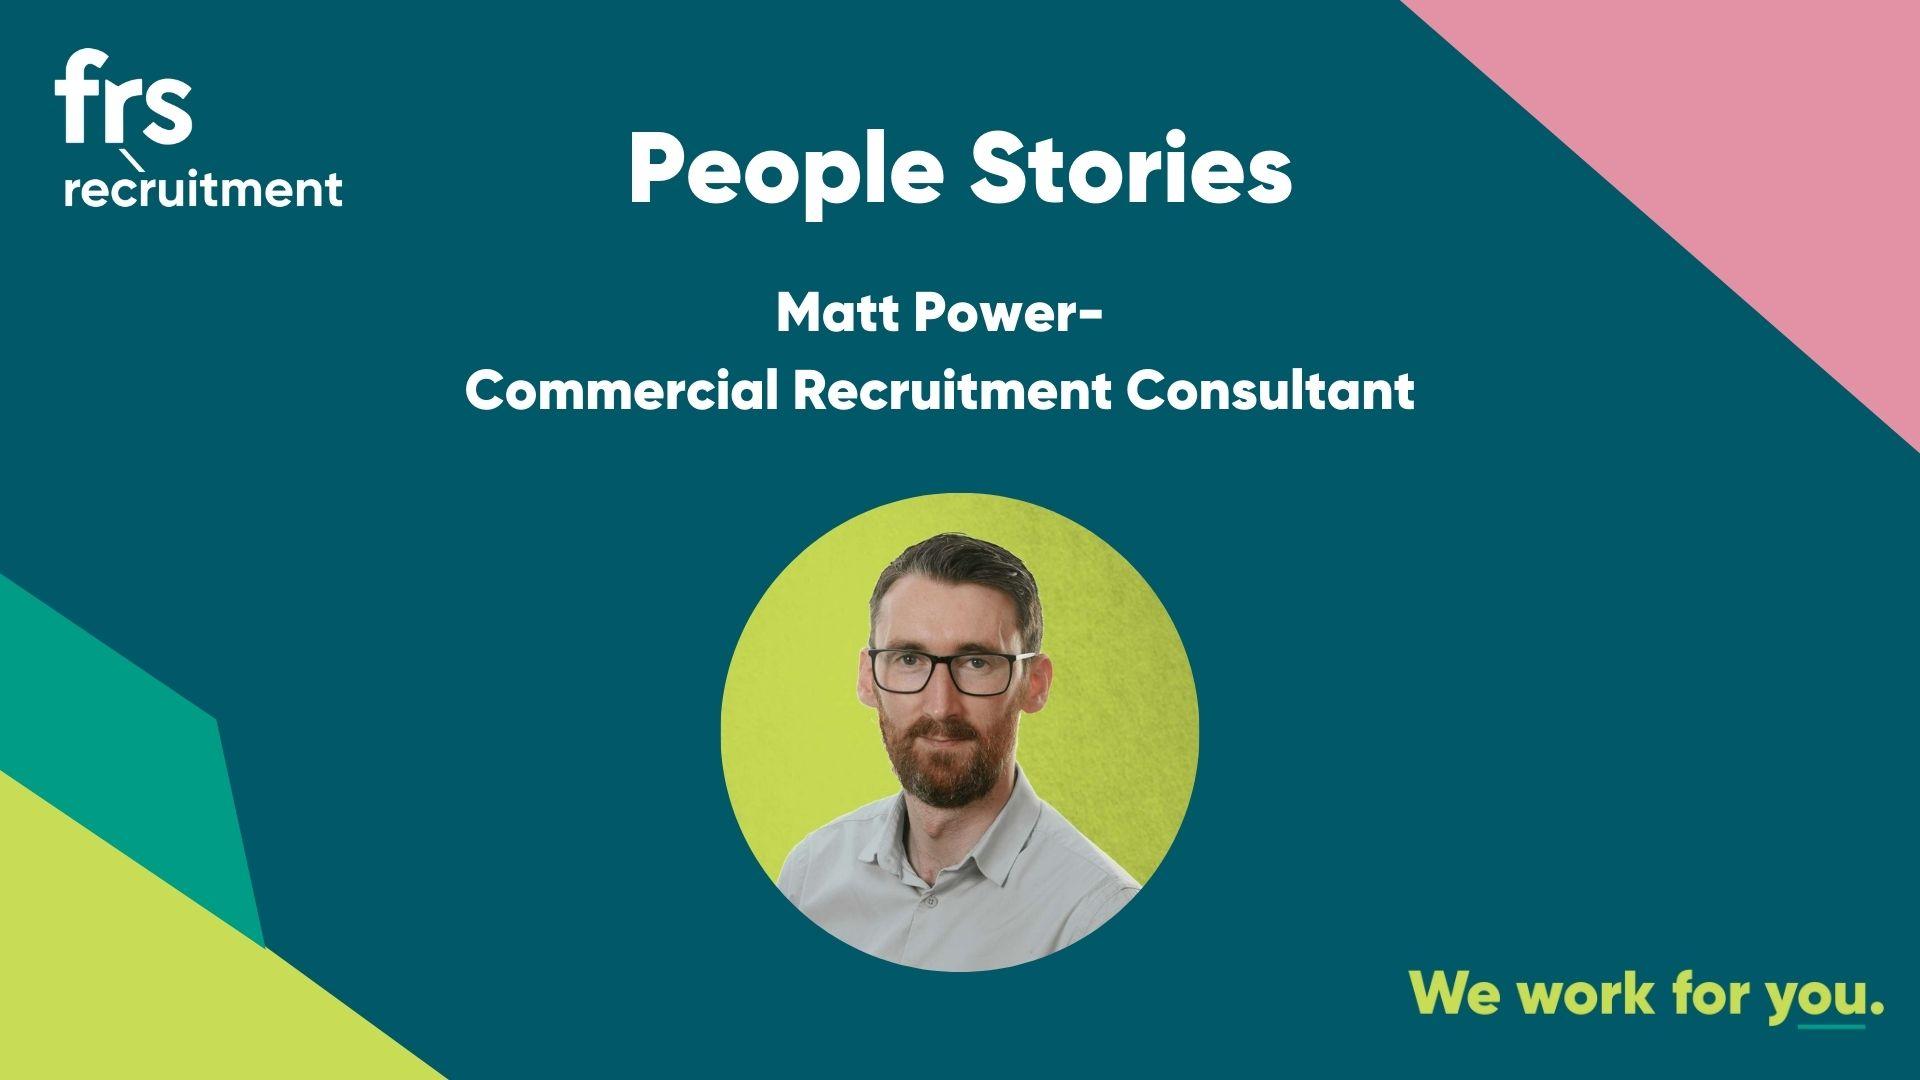 Matt Power- Industrial Commercial Recruitment Consultant